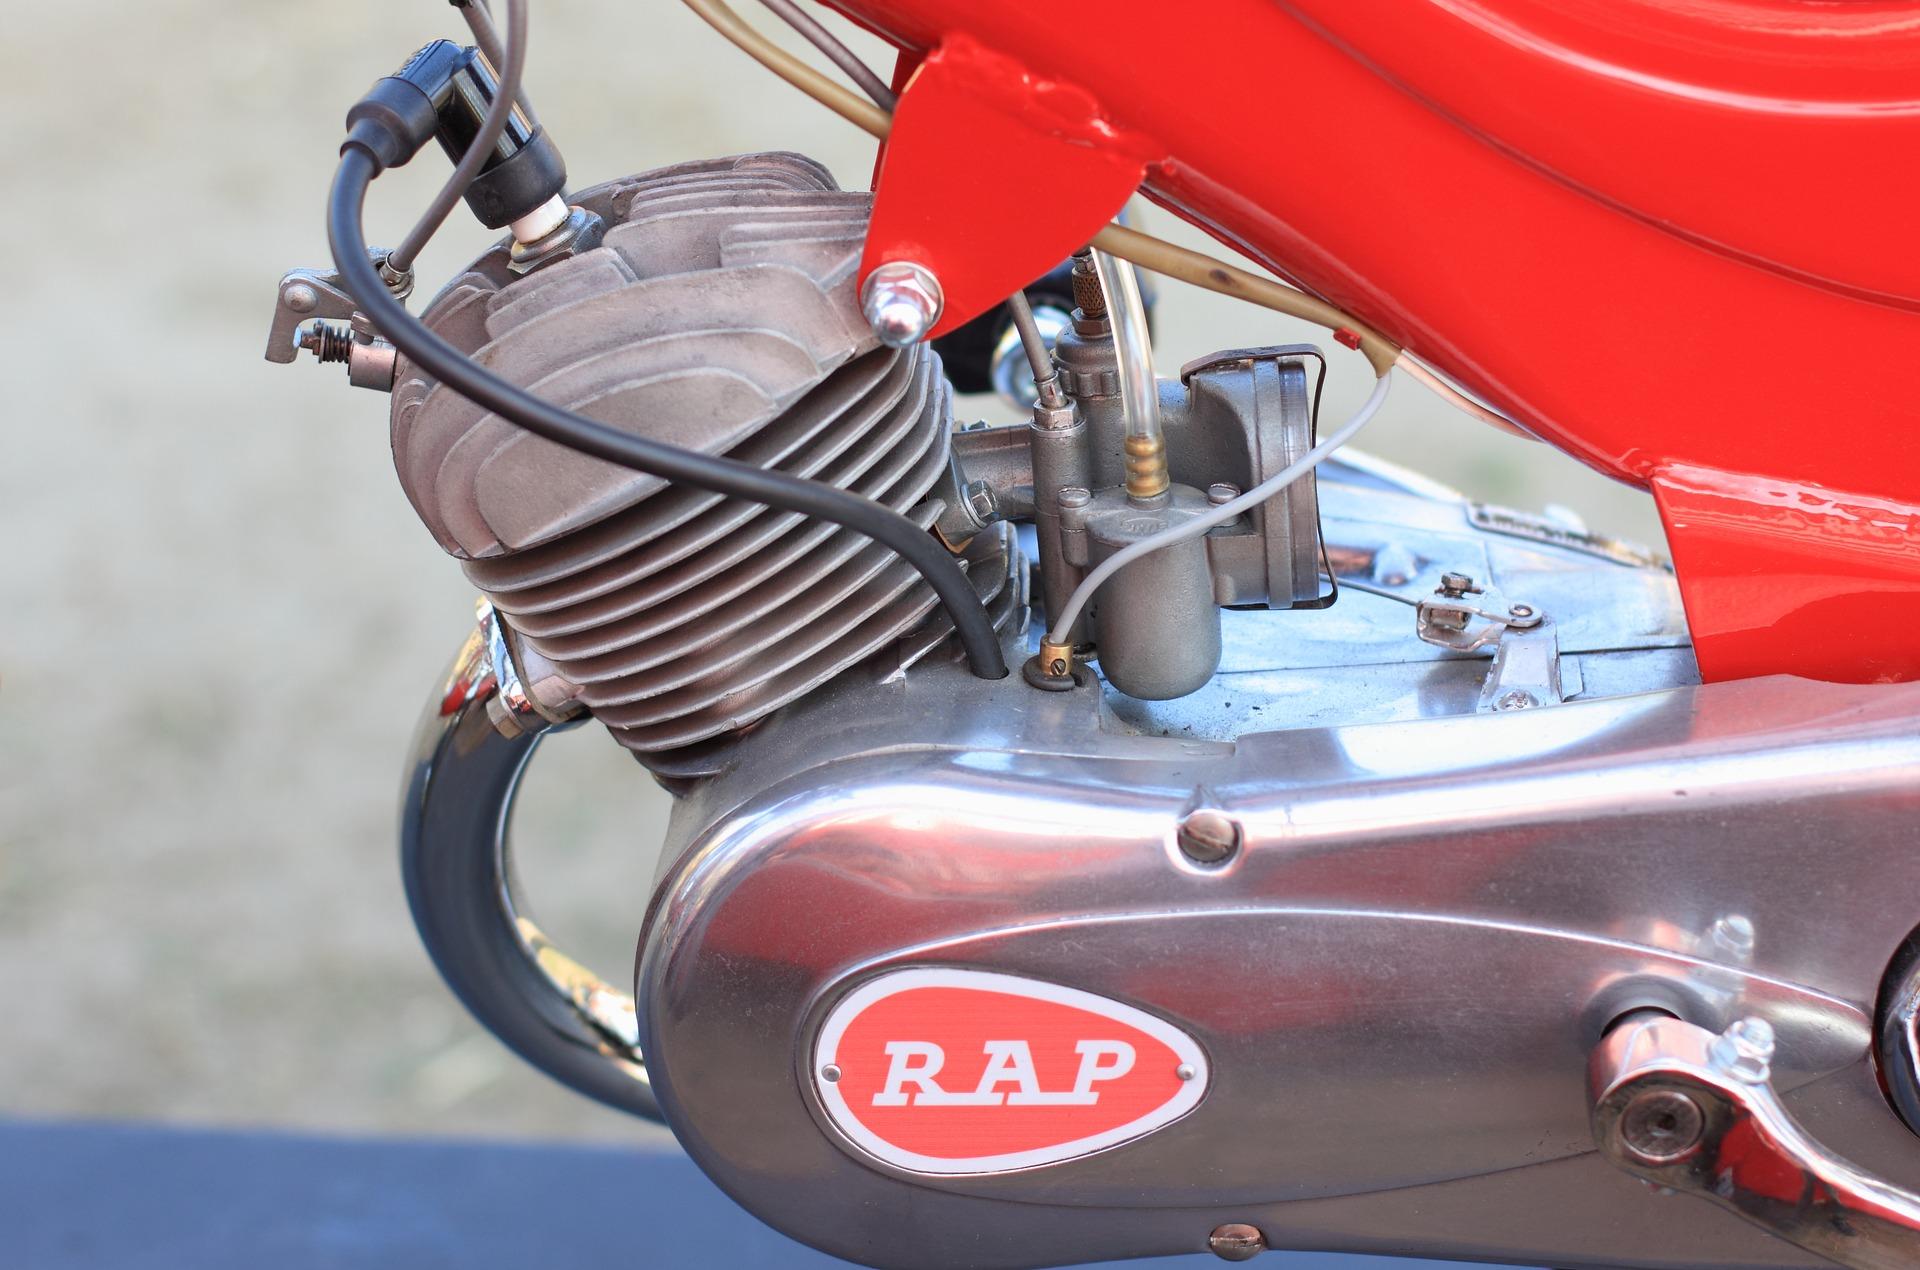 rap-motor-motorblok-brommer